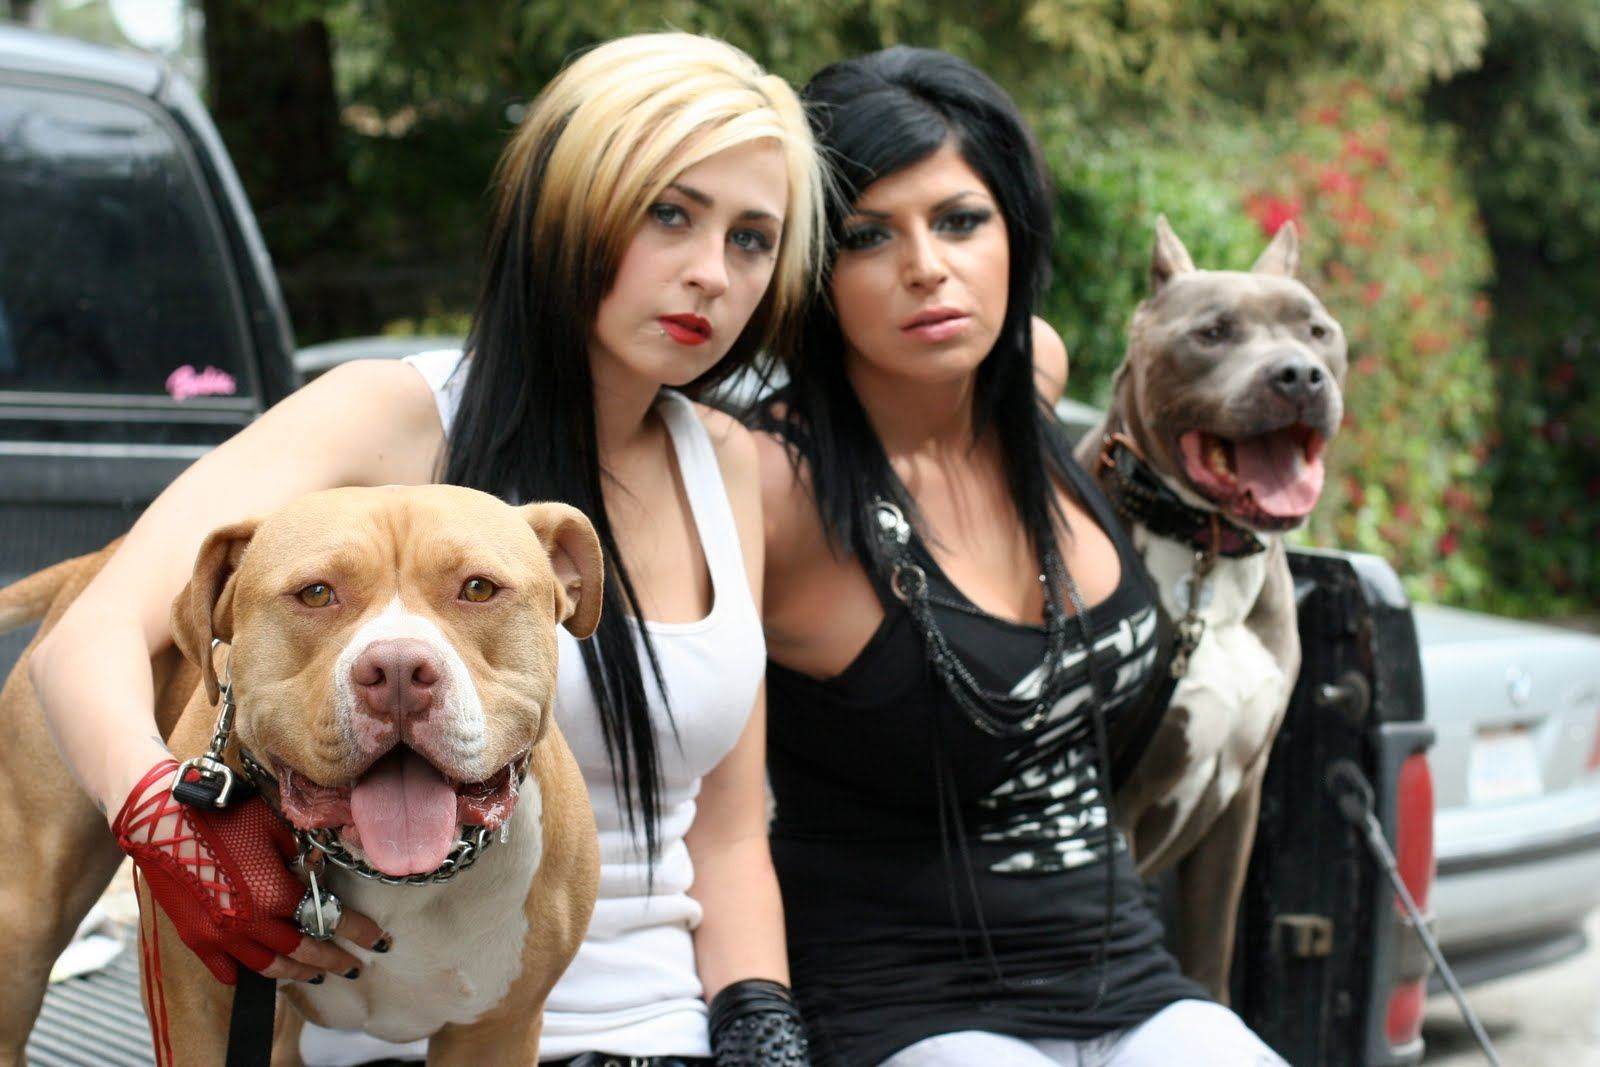 Villalobos Crew And Personal Dogs Mariah Harmony Torres And Tania Torres Pitbulls Pit Bulls Parolees Pit Bulls